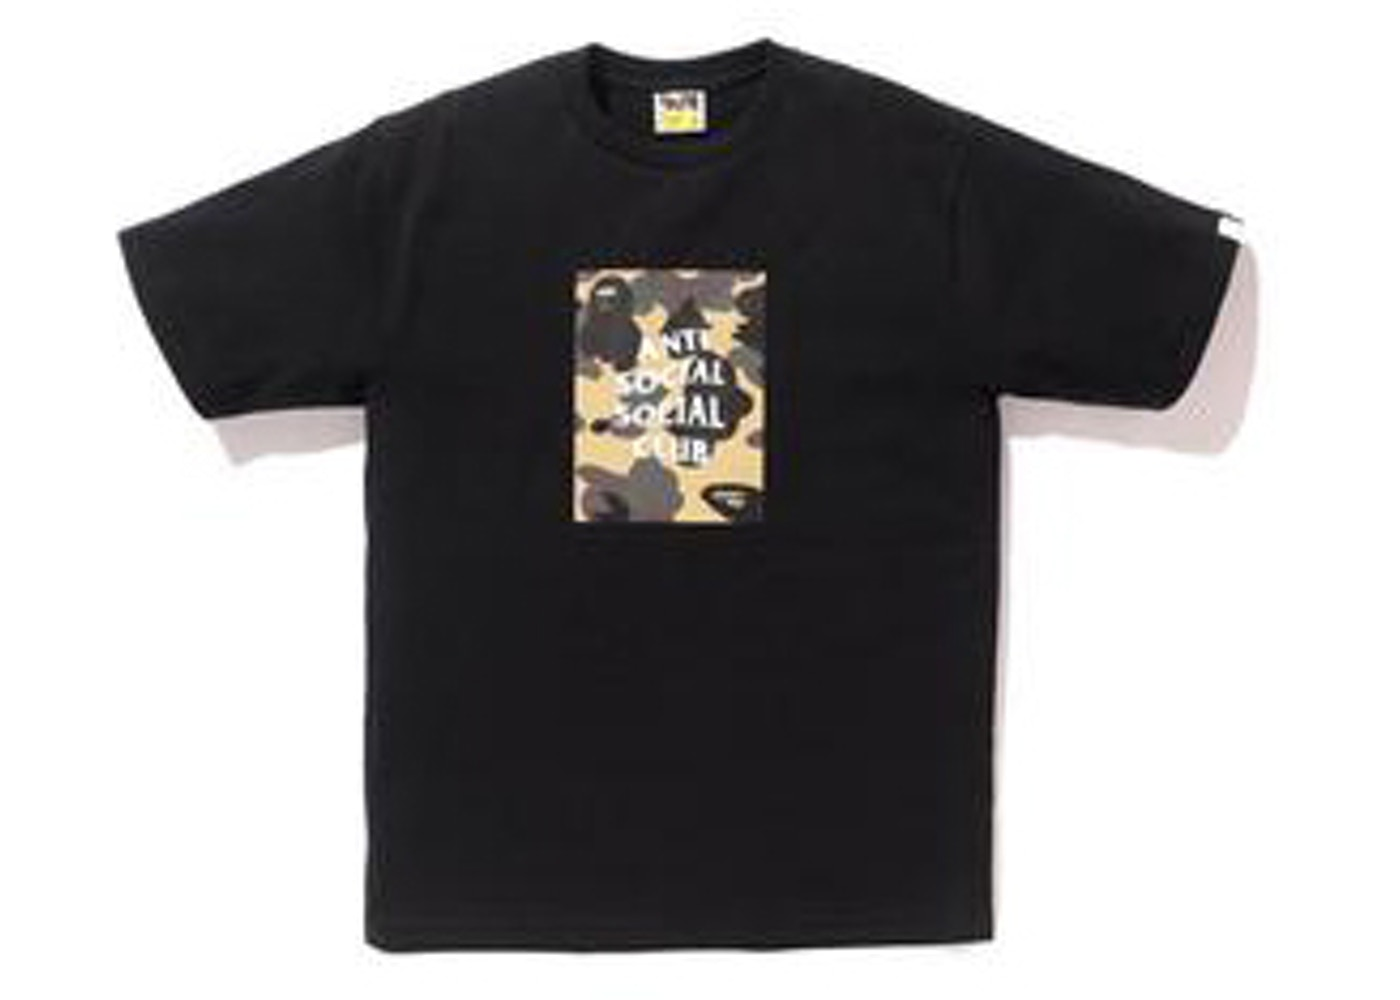 51a2f7270b6f BAPE x Anti Social Social Club 1st Camo Box Tee Black Yellow Camo - SS17